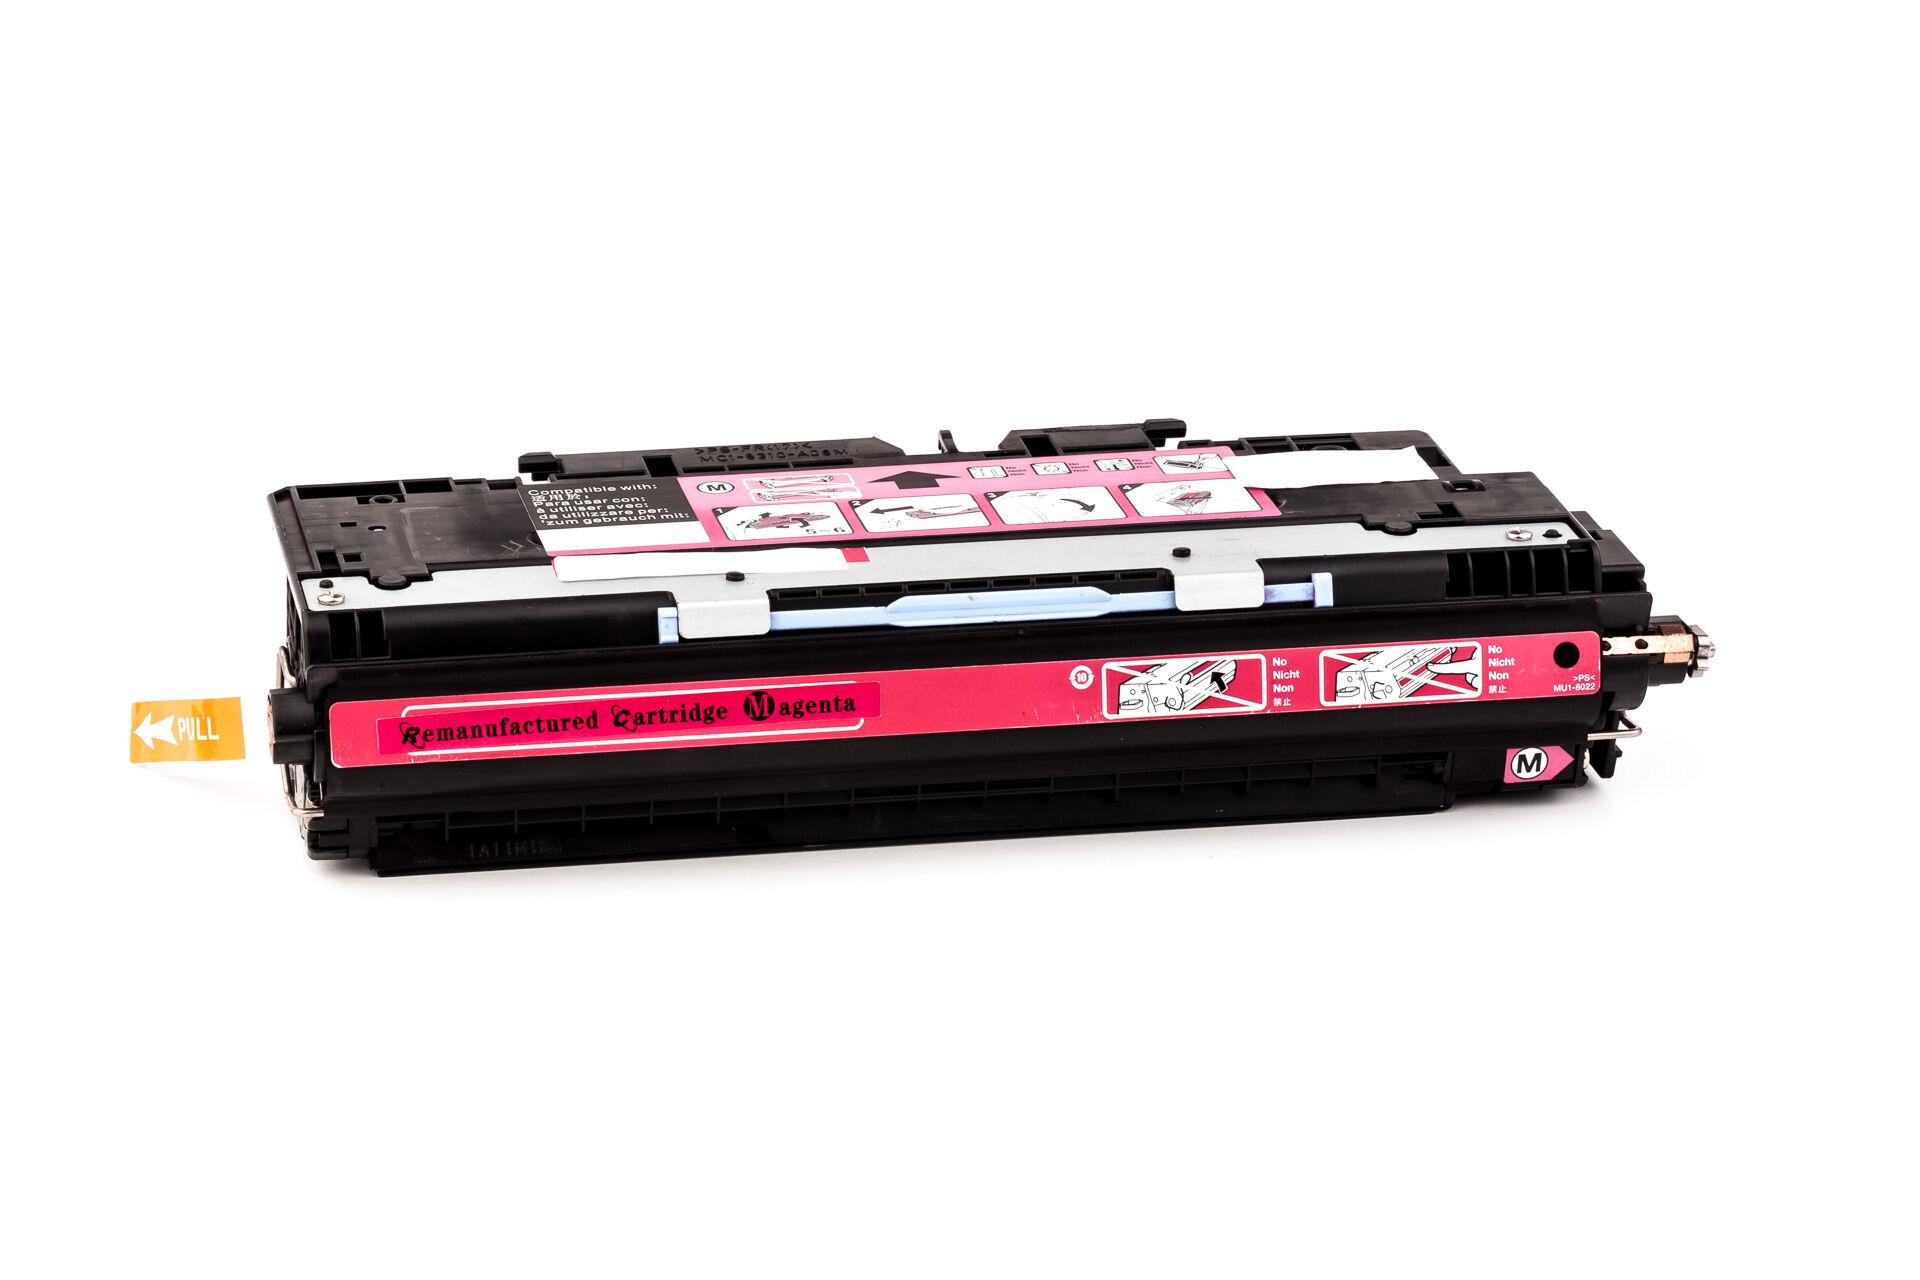 HP Cartouche de Toner pour HP Q2673A / 309A magenta compatible (de marque ASC)